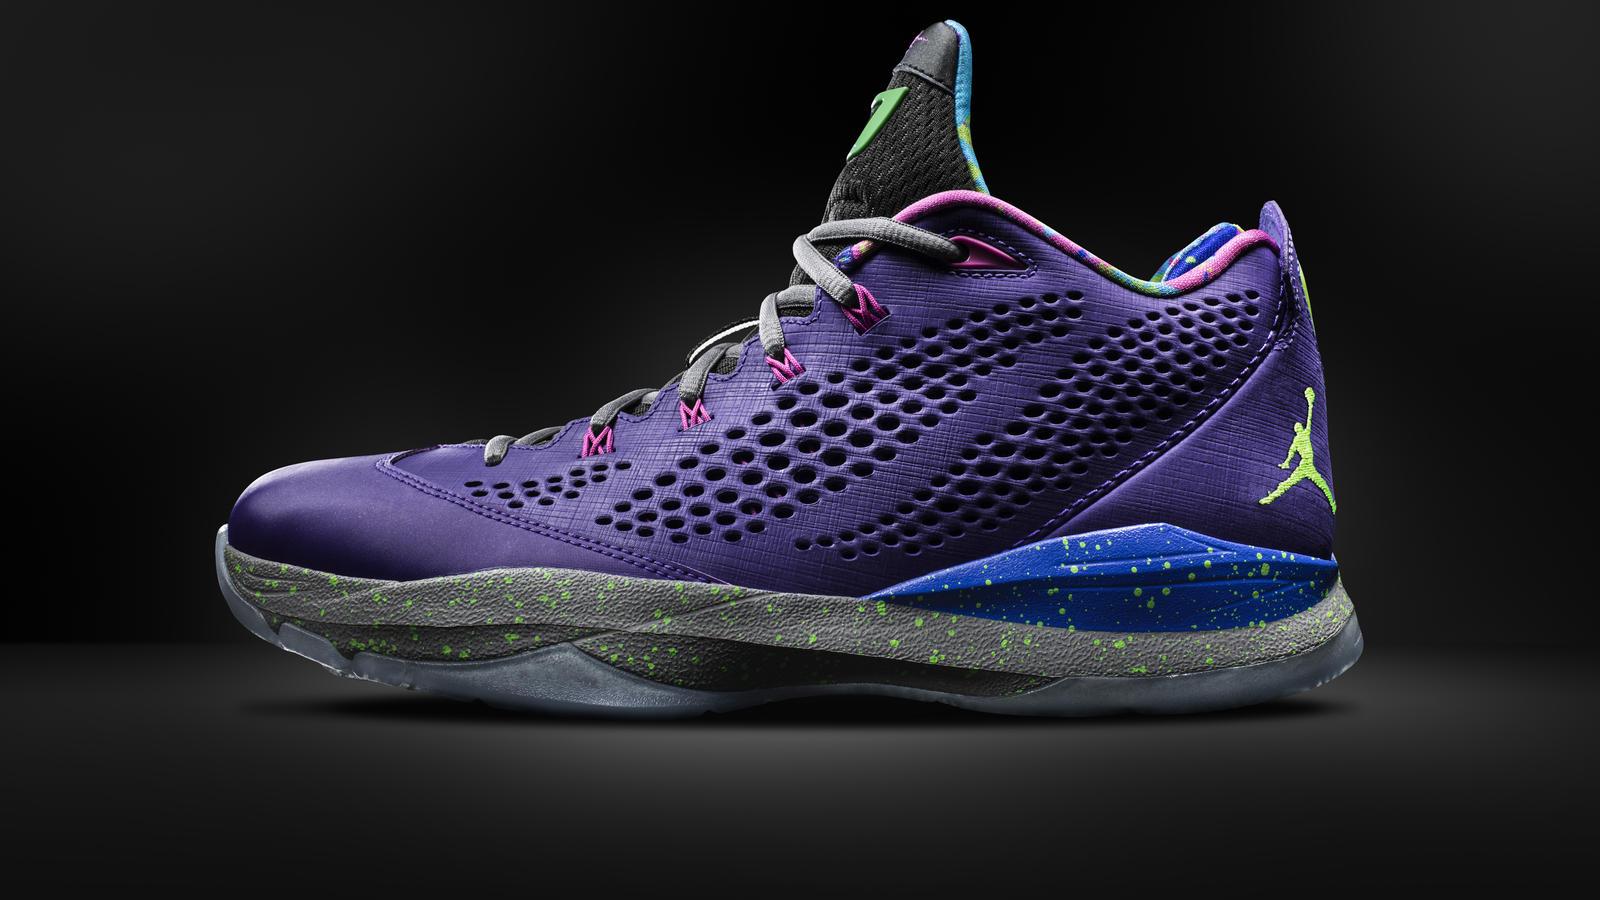 super popular c6e9d c73b4 Jordan CP3.VII Court Purple - Lateral View